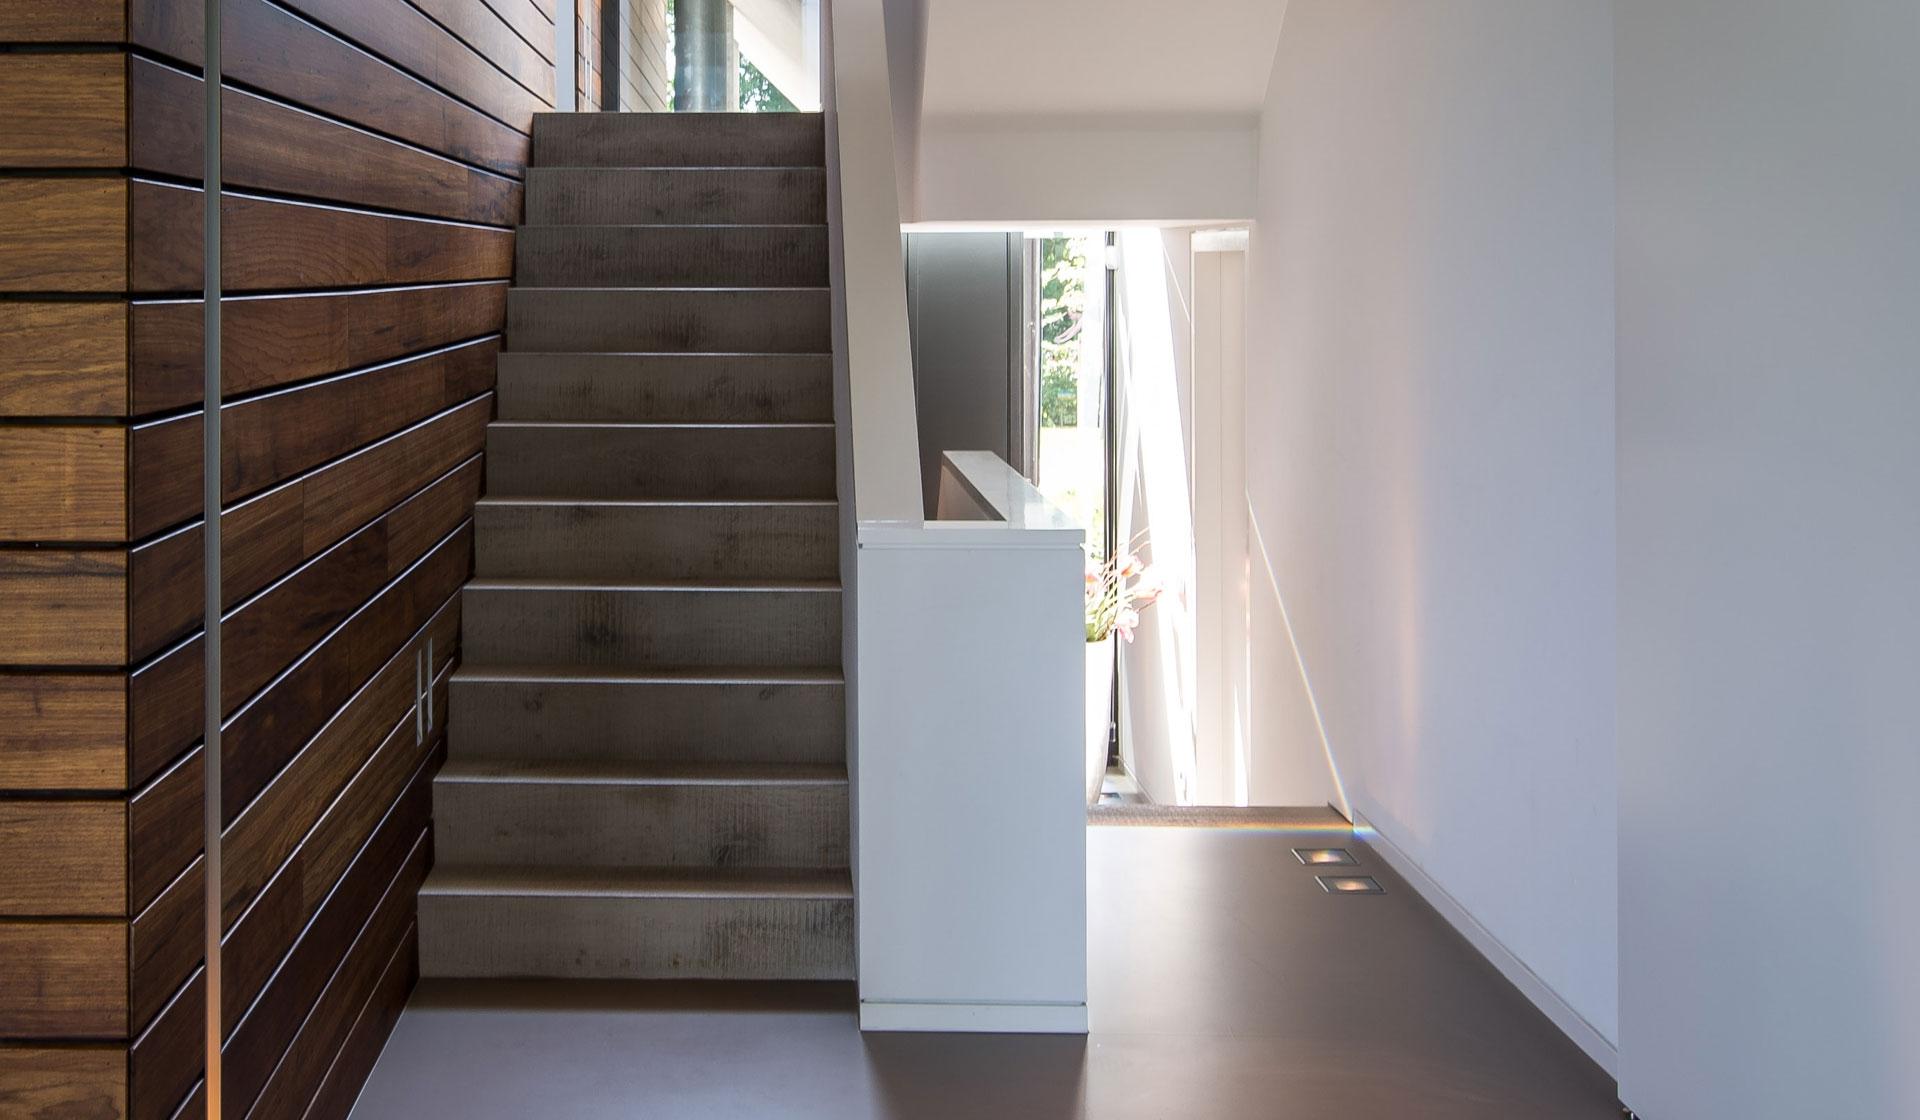 Interieurontwerp moderne villa - Het Fundament Architectuur